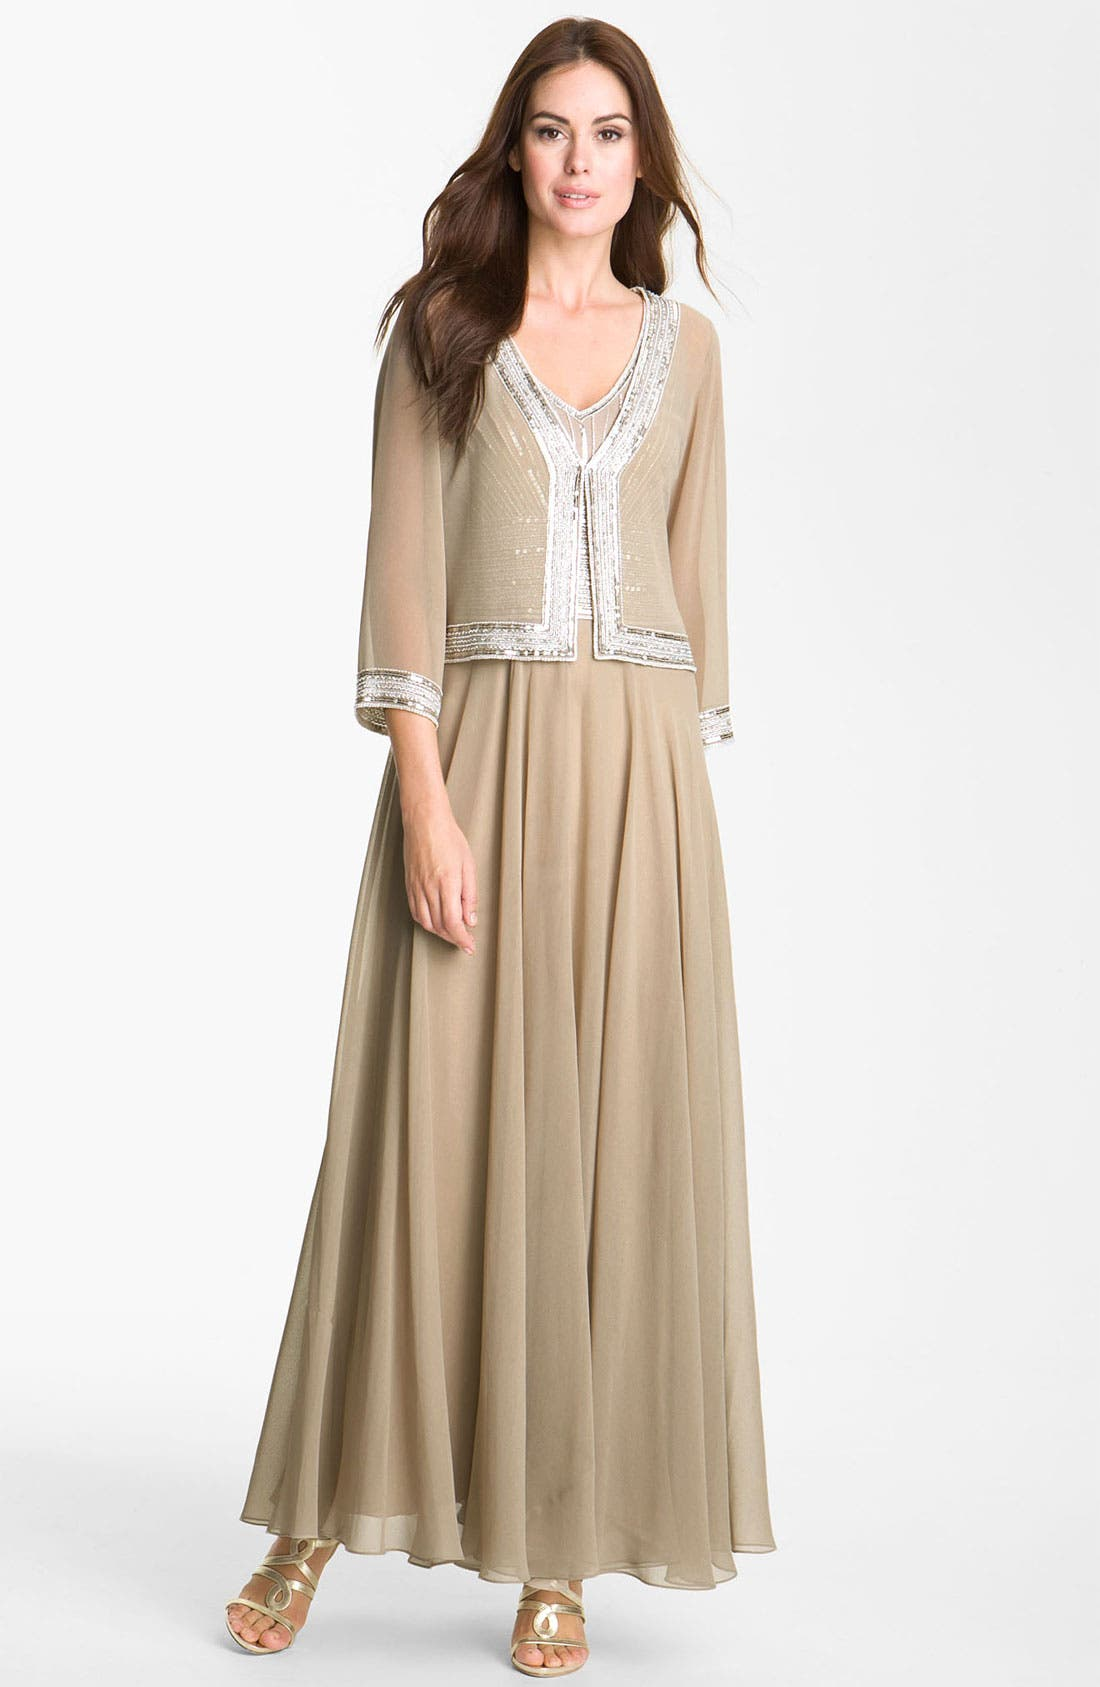 Main Image - J Kara Embellished Chiffon Gown & Jacket